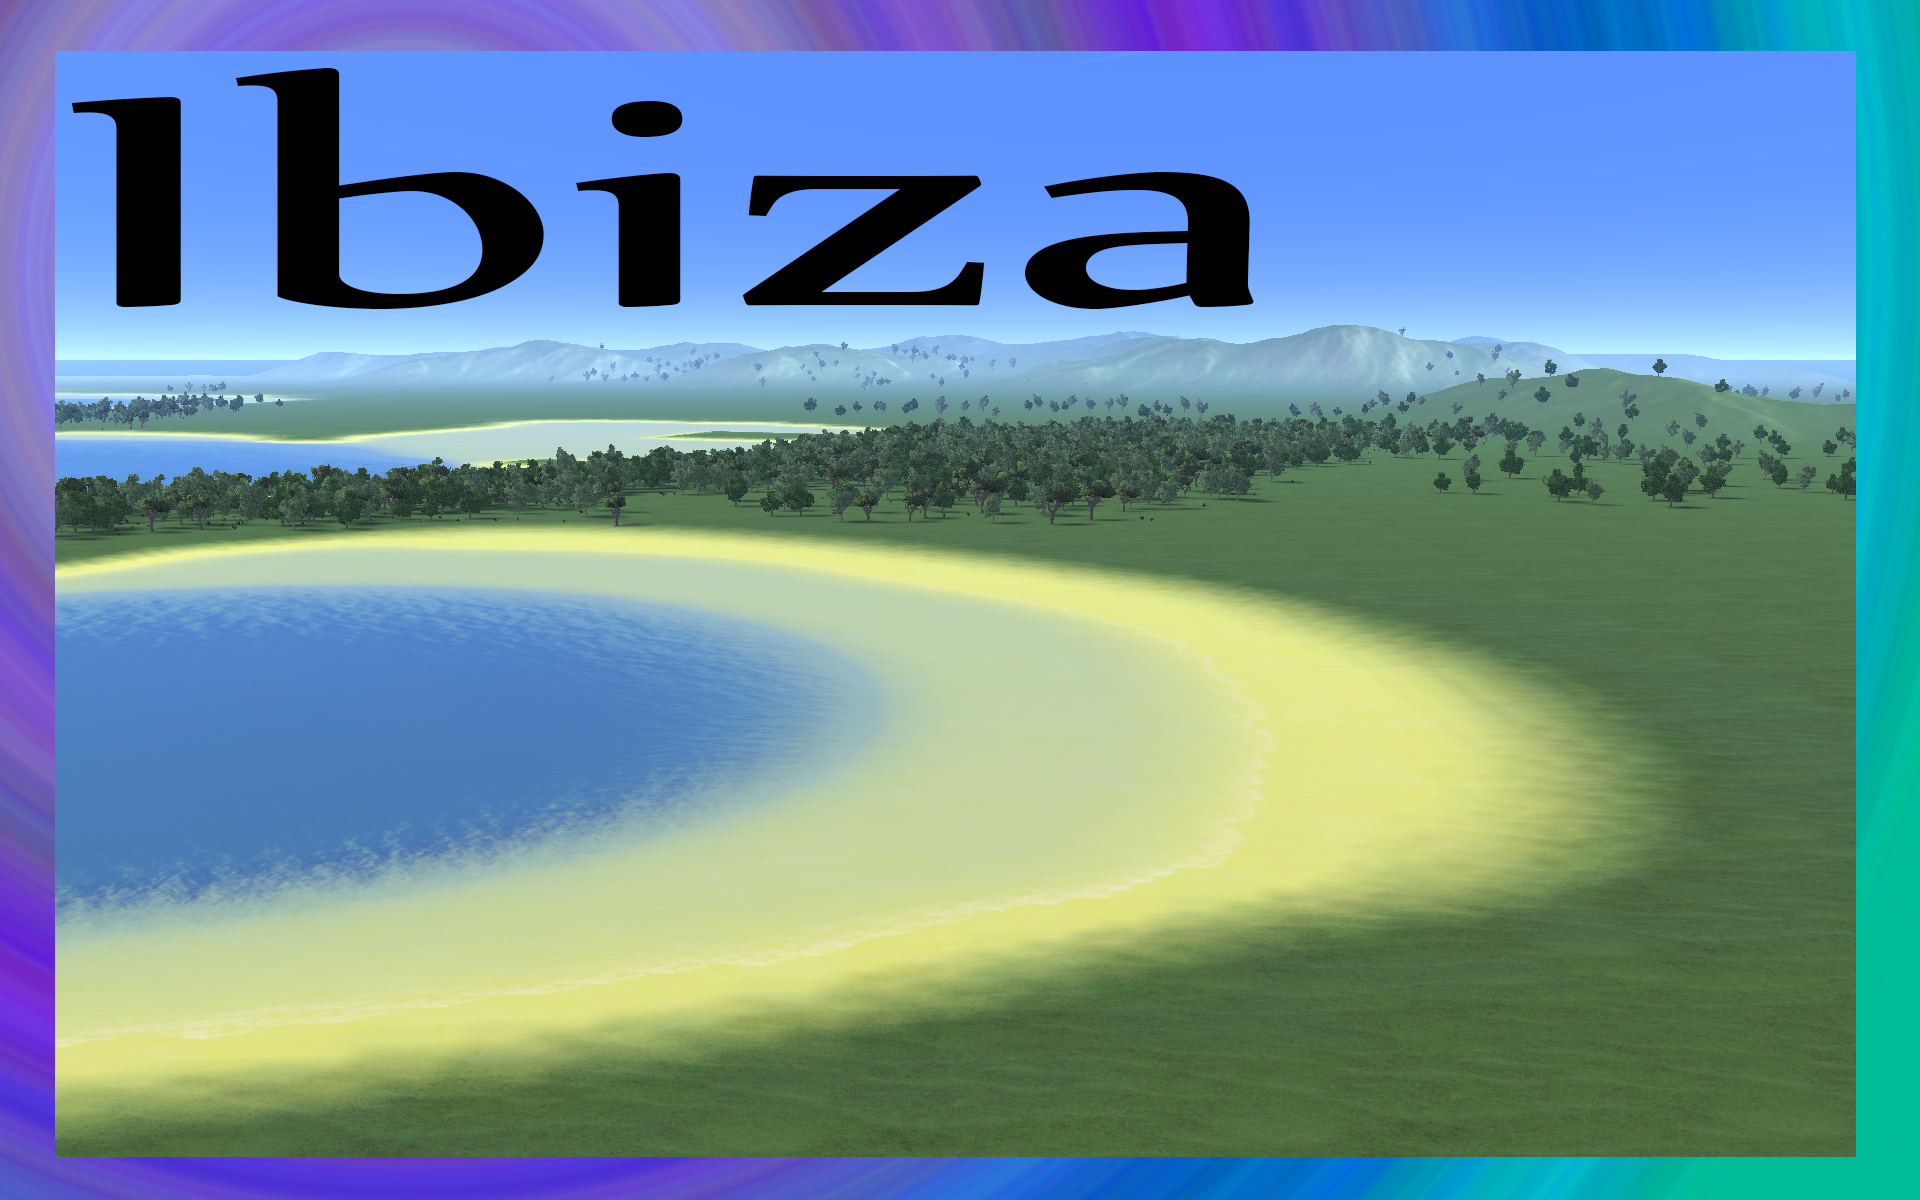 Ibiza01.jpg